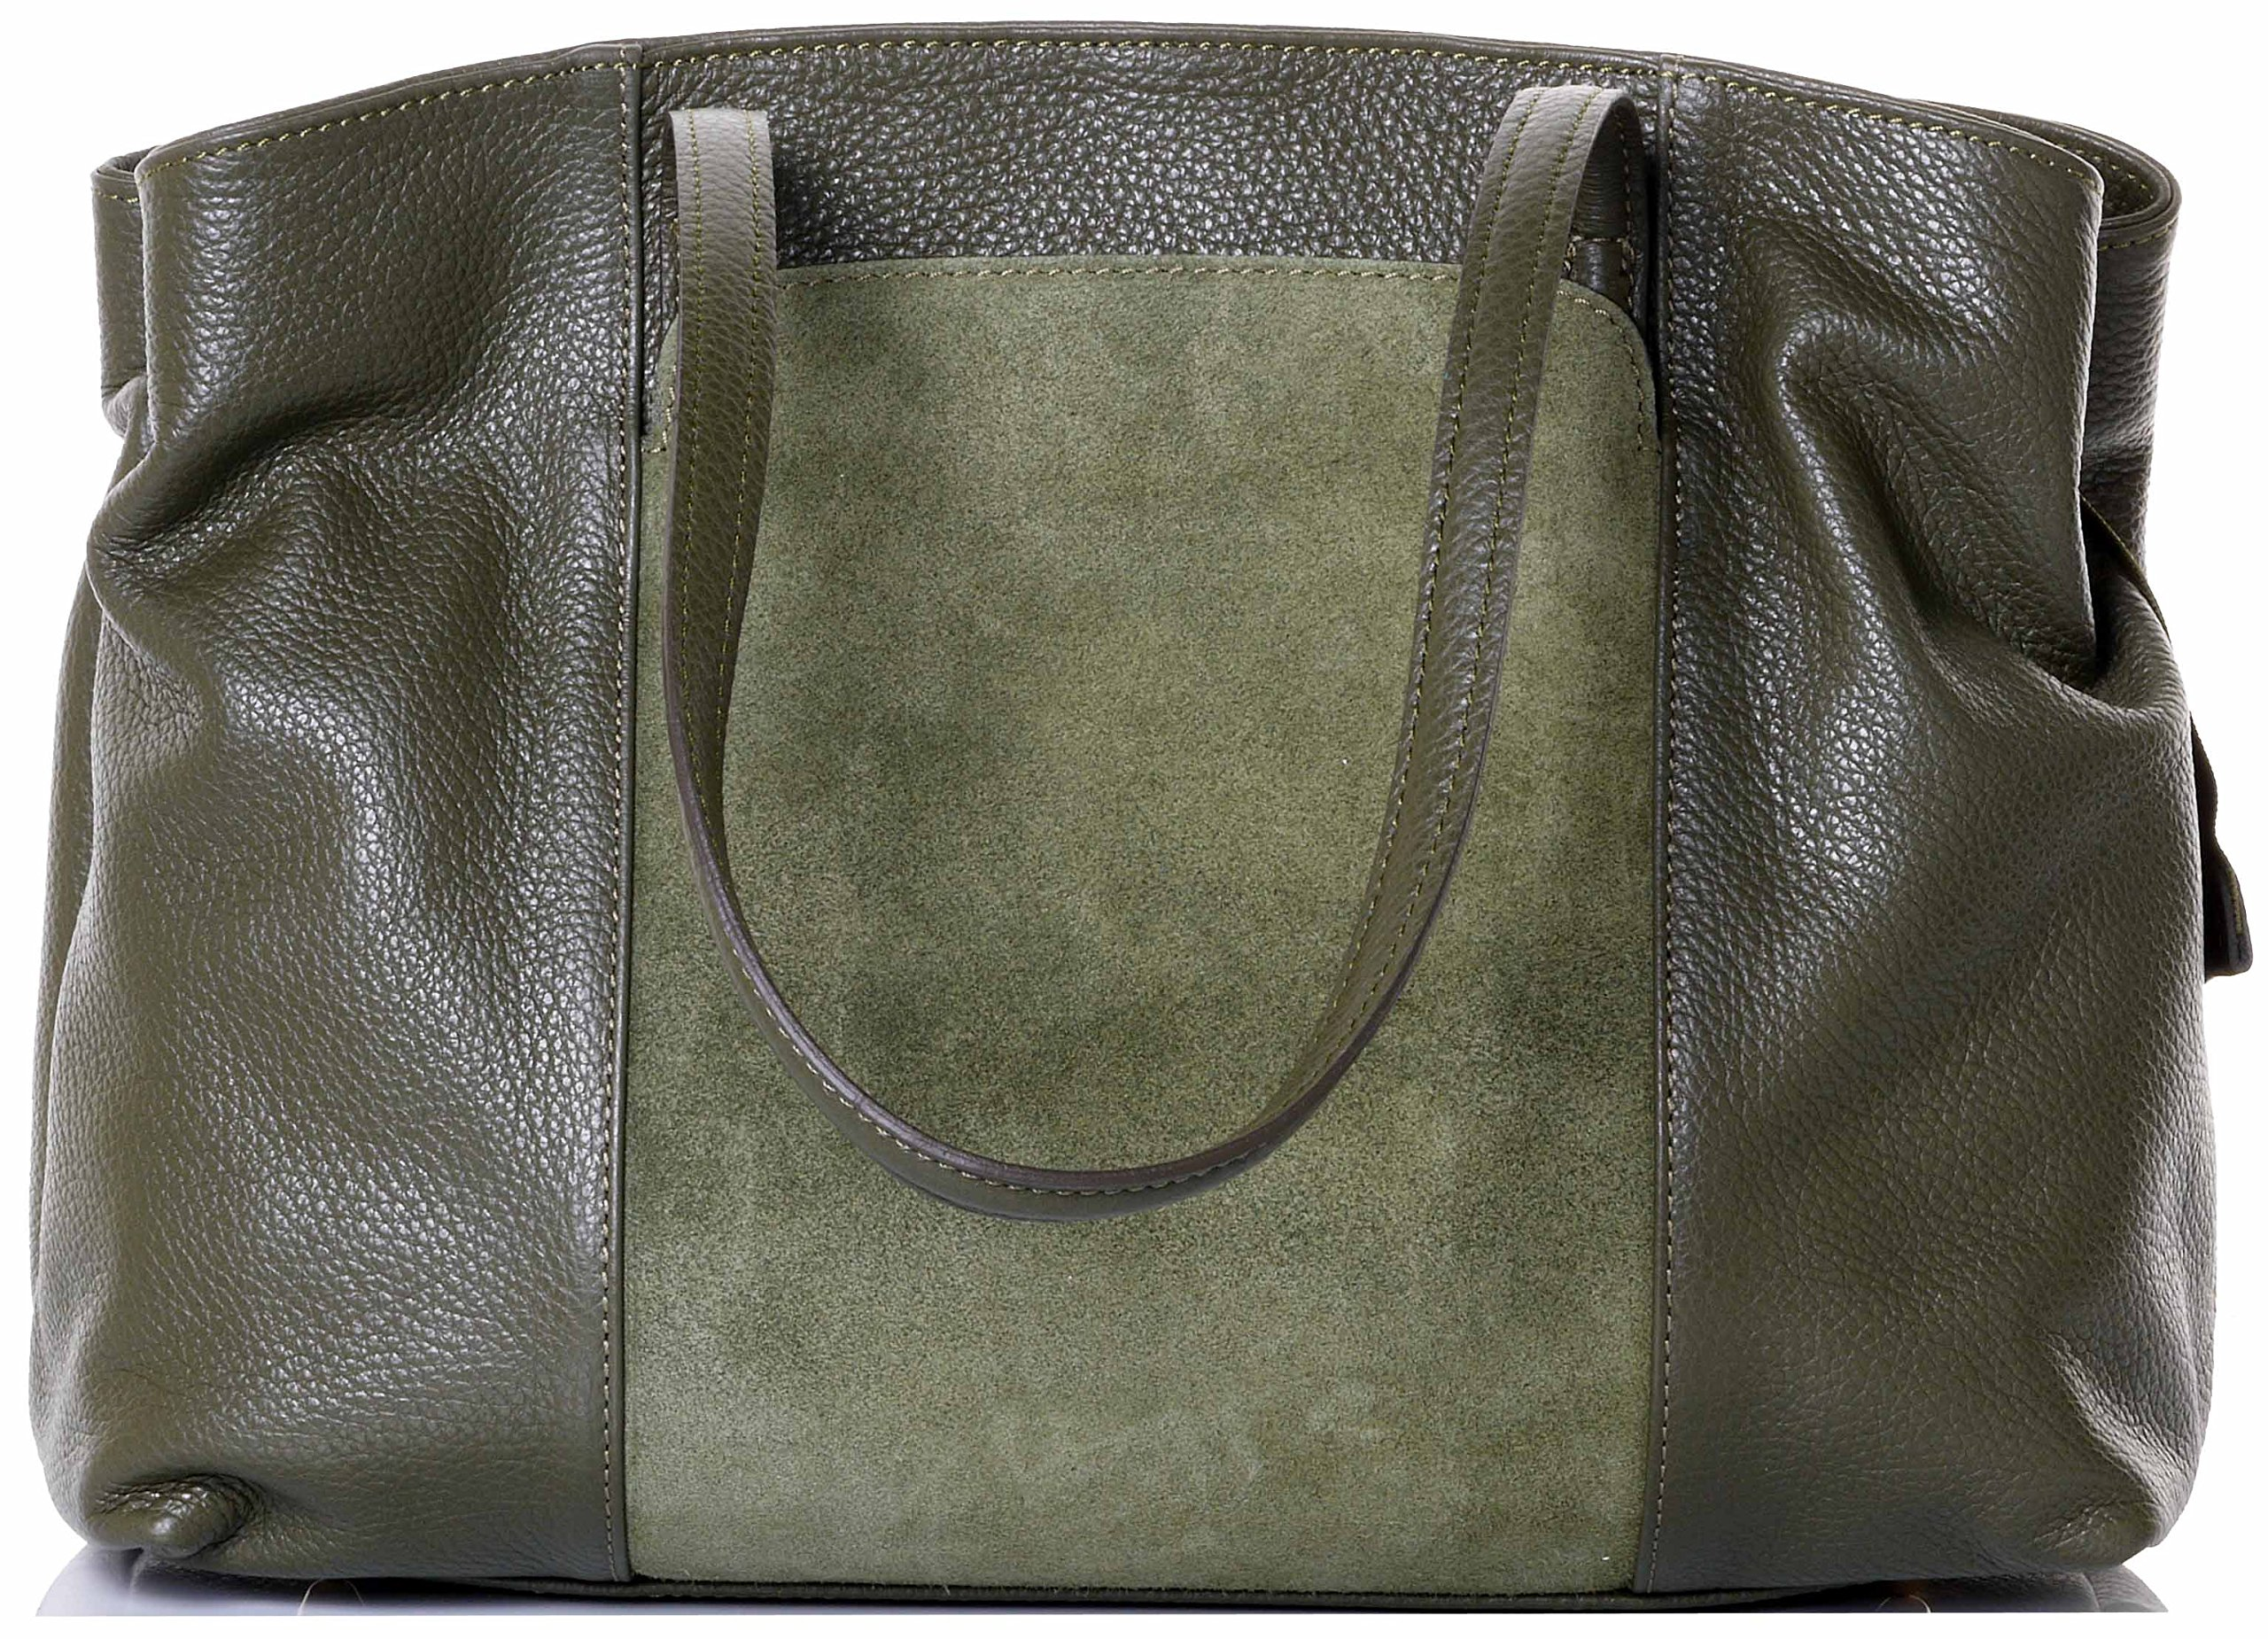 Primo Sacchi Italian Textured Leather Olive Green Hand Made Large Long Handle Shoulder Bag Handbag, with Suede Front Panel Pocket, Includes a Branded Protective Storage Bag